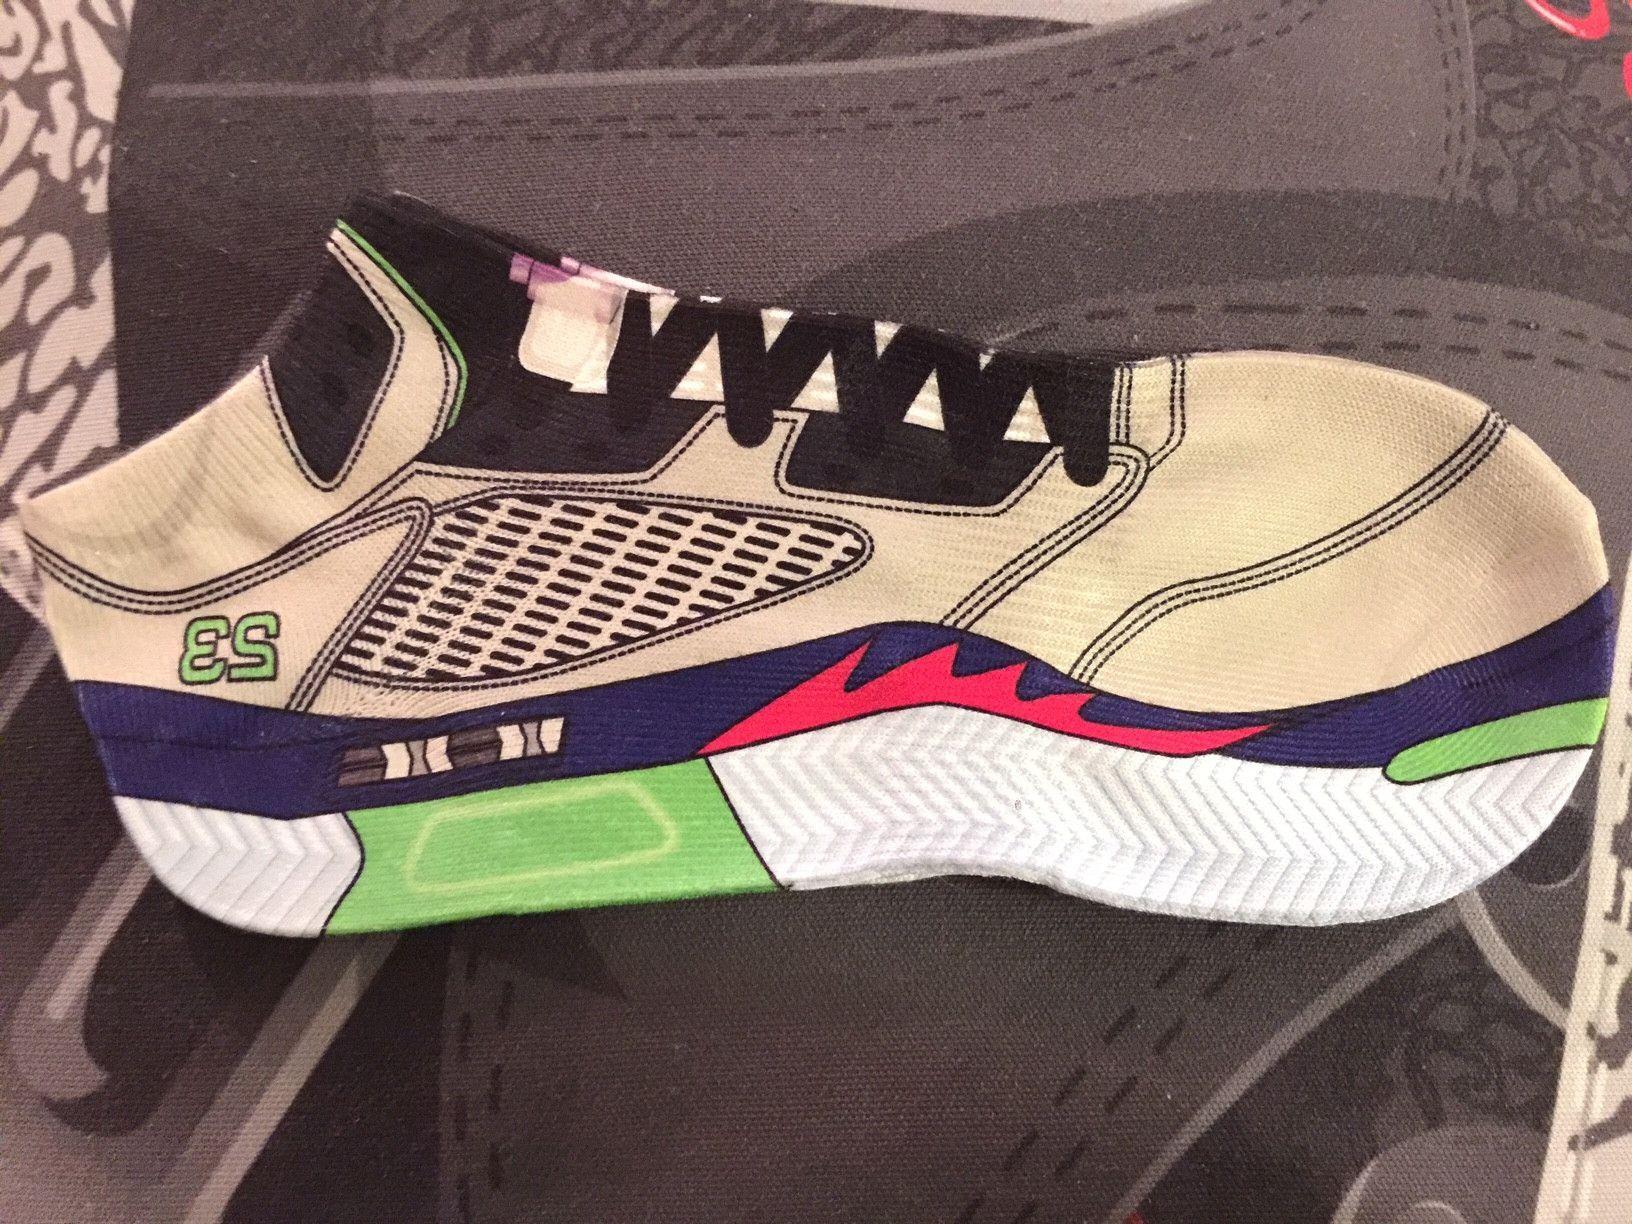 169aa2f12a4d37 Nike Air Foamposite One